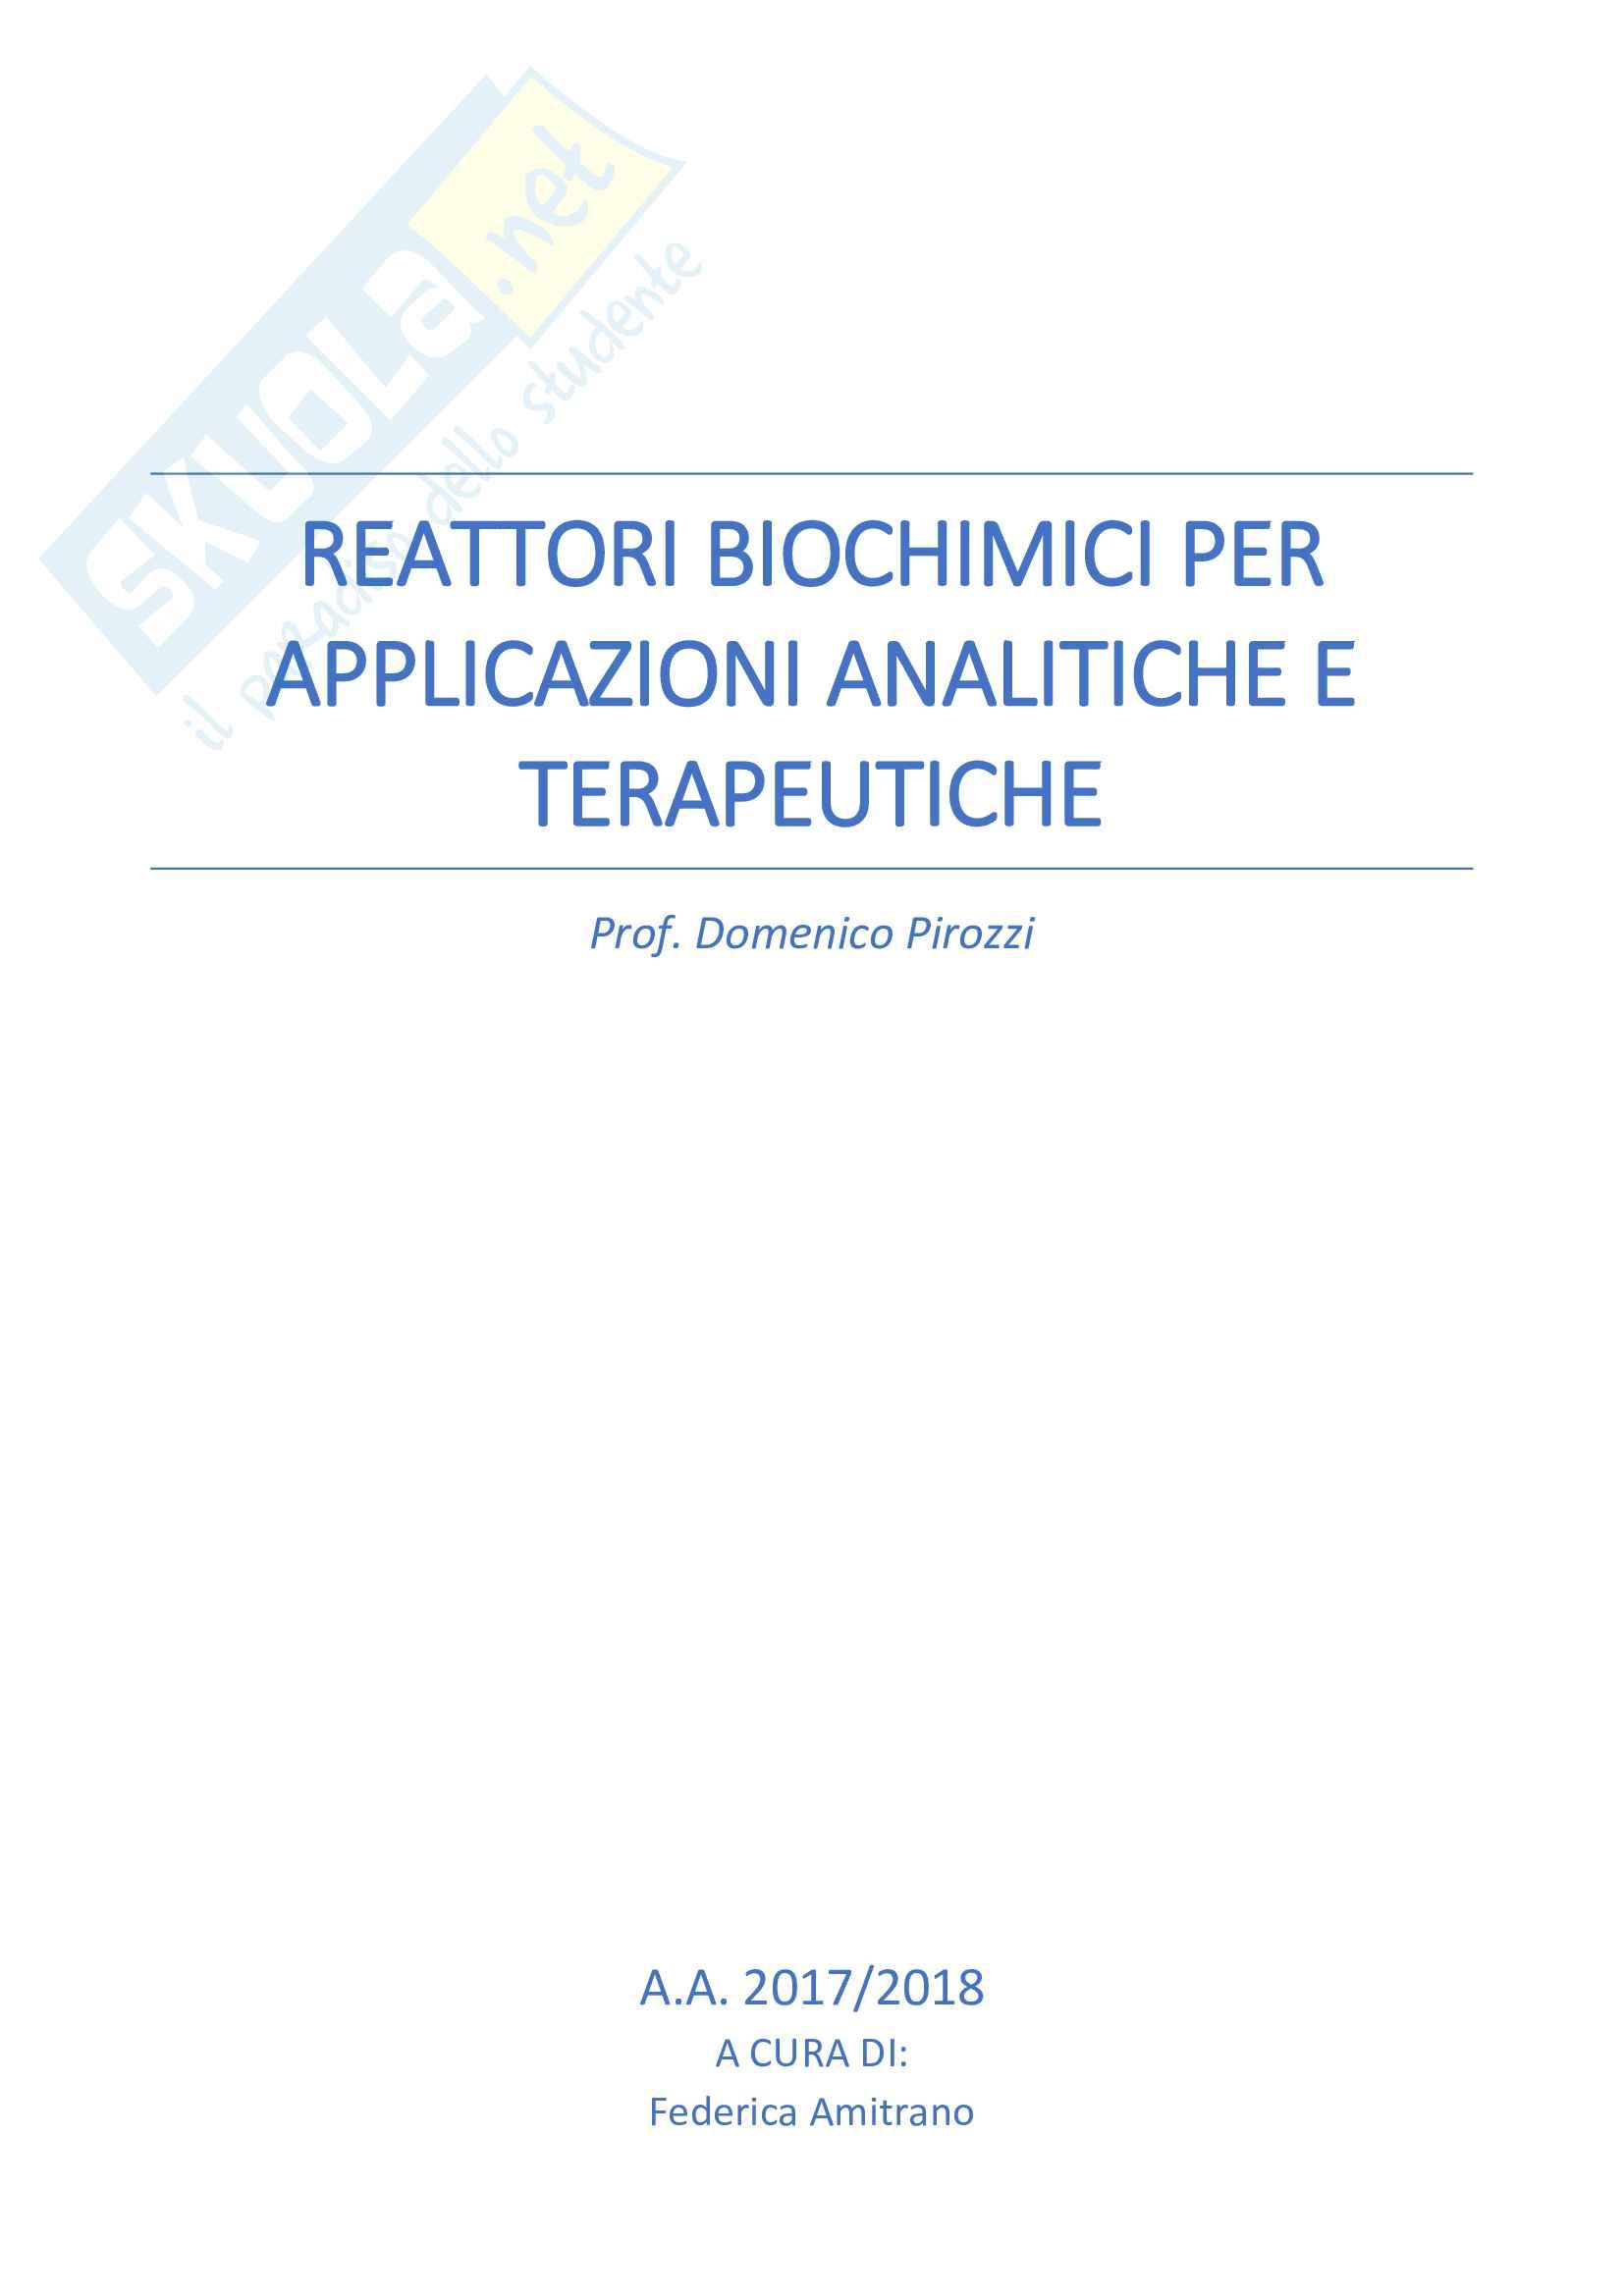 Reattori Biochimici per Applicazioni Analitiche e Terapeutiche (RBAAT) - Prof. D. Pirozzi